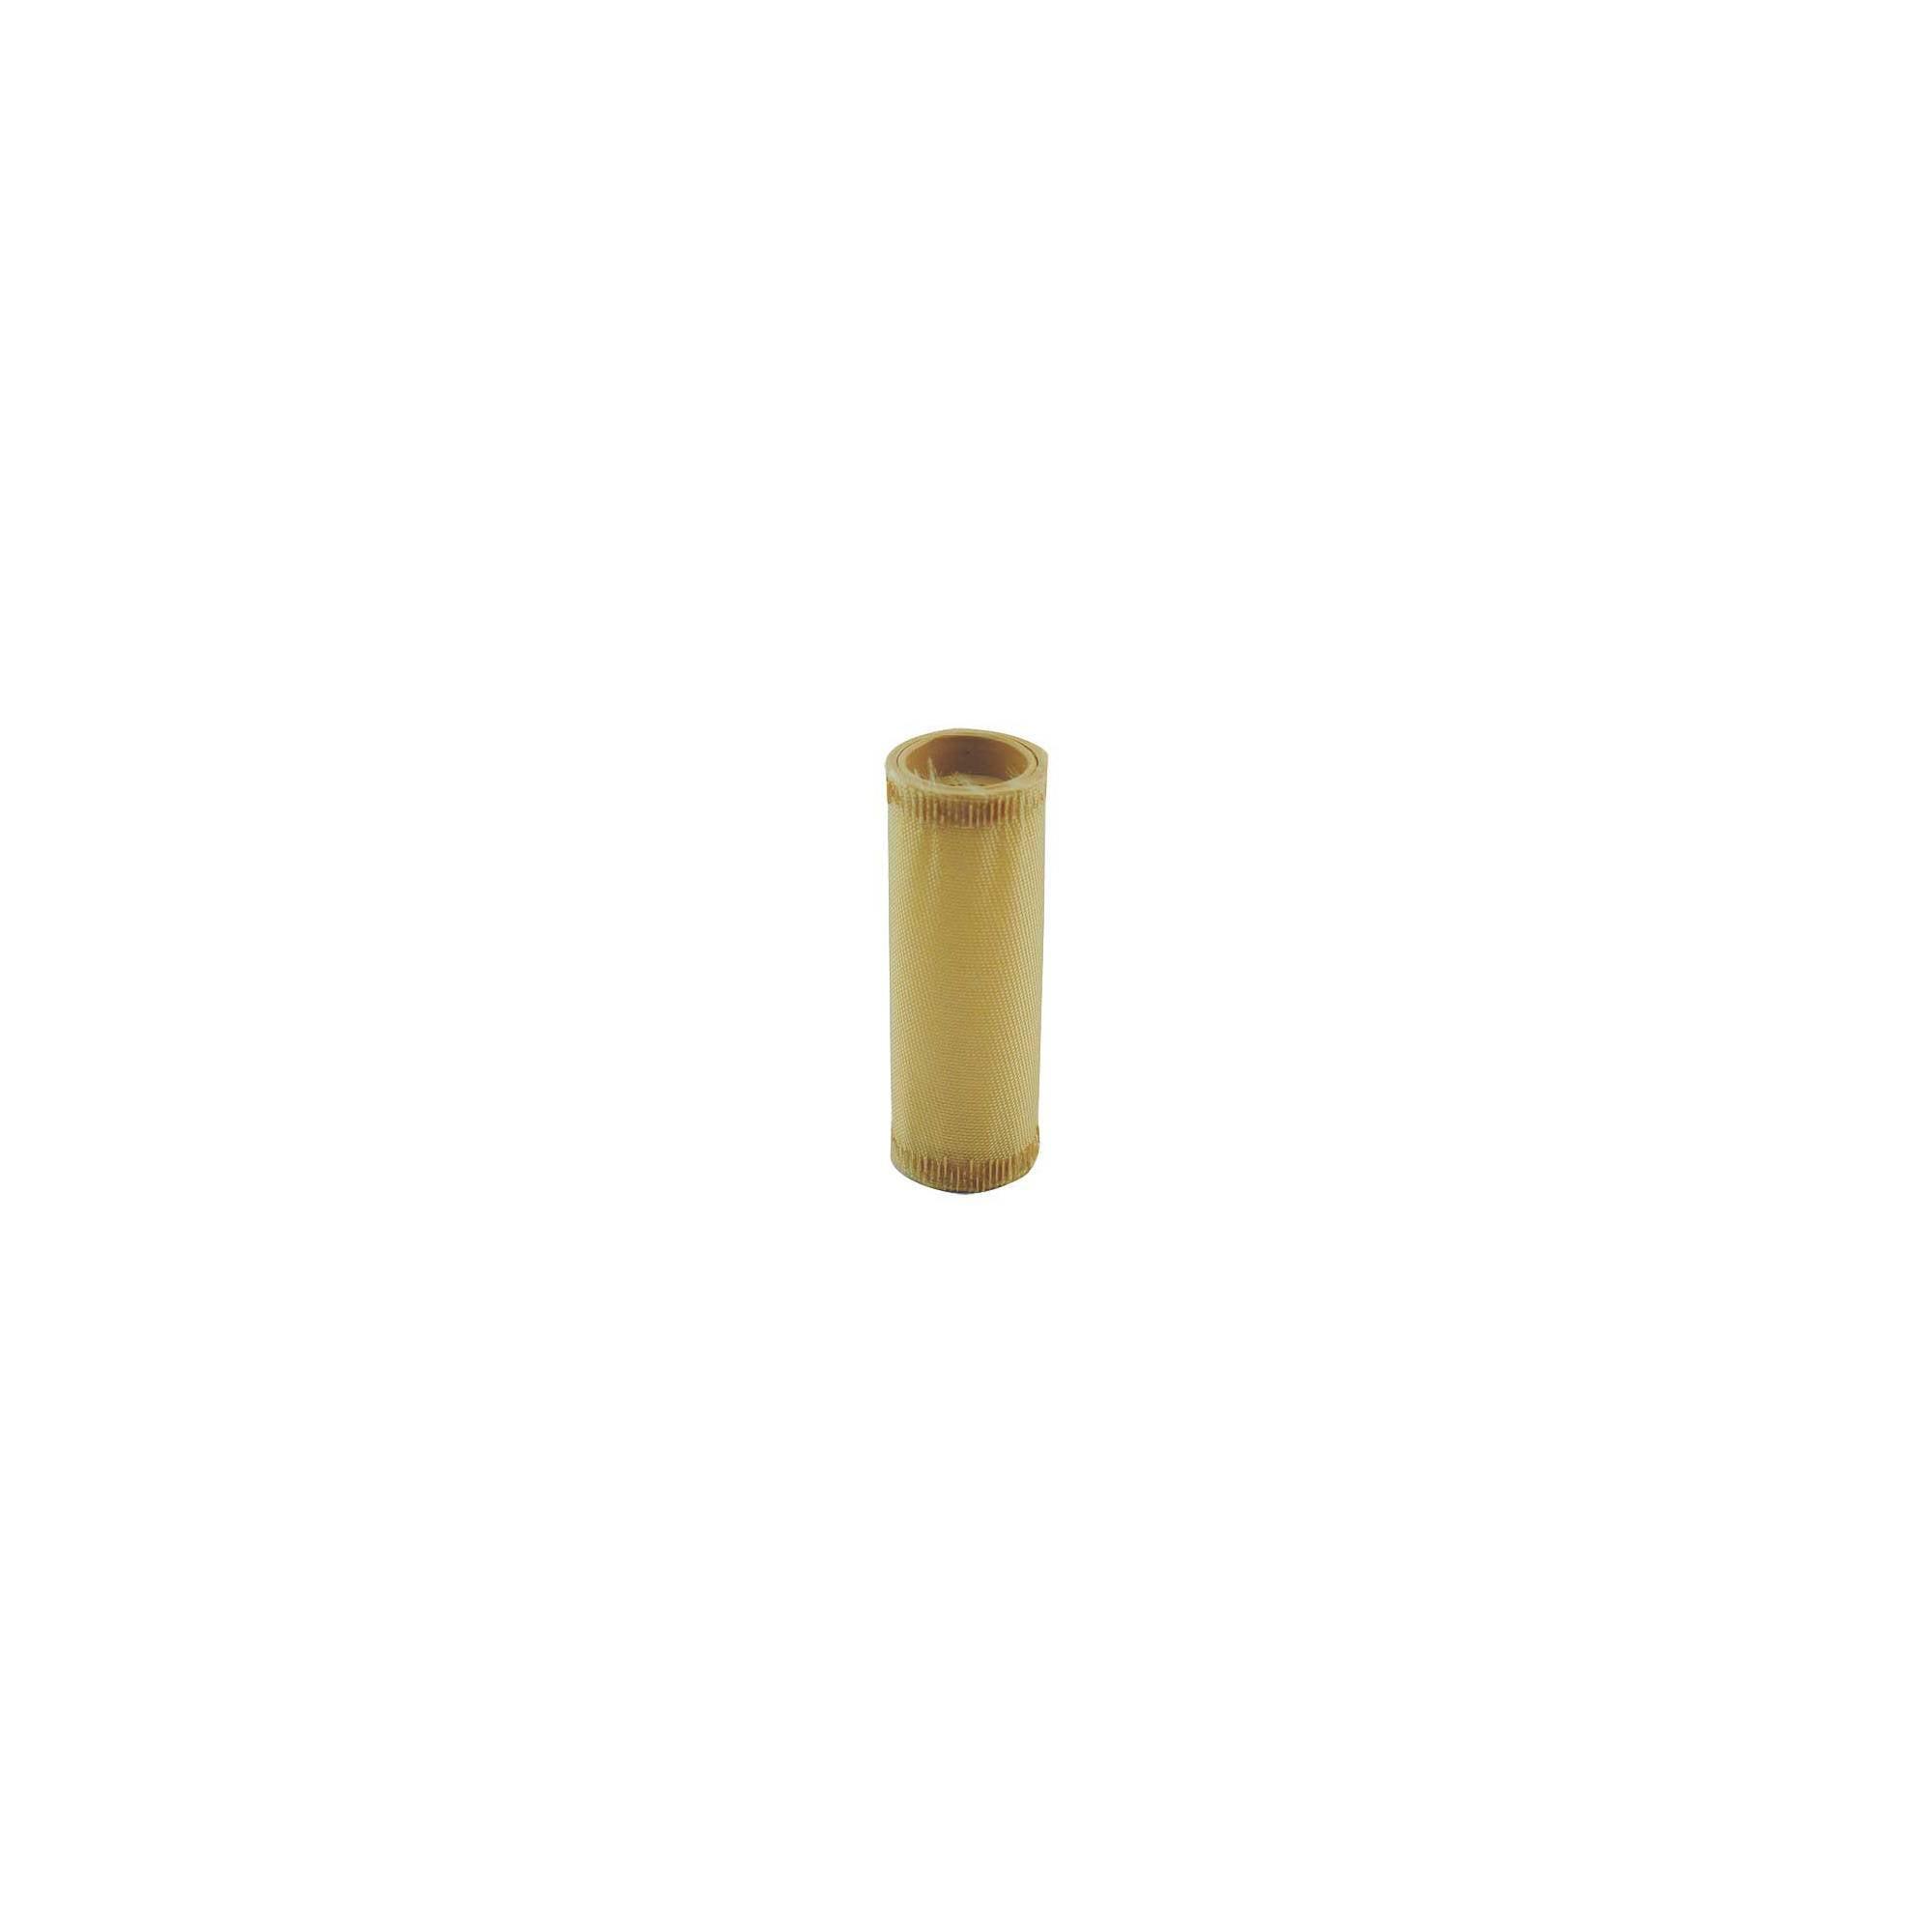 Threaded Brass MACs Auto Parts 28-24763 Model A Gas Sediment Bowl Plug For Cast Iron Style Sediment Bowl Lower